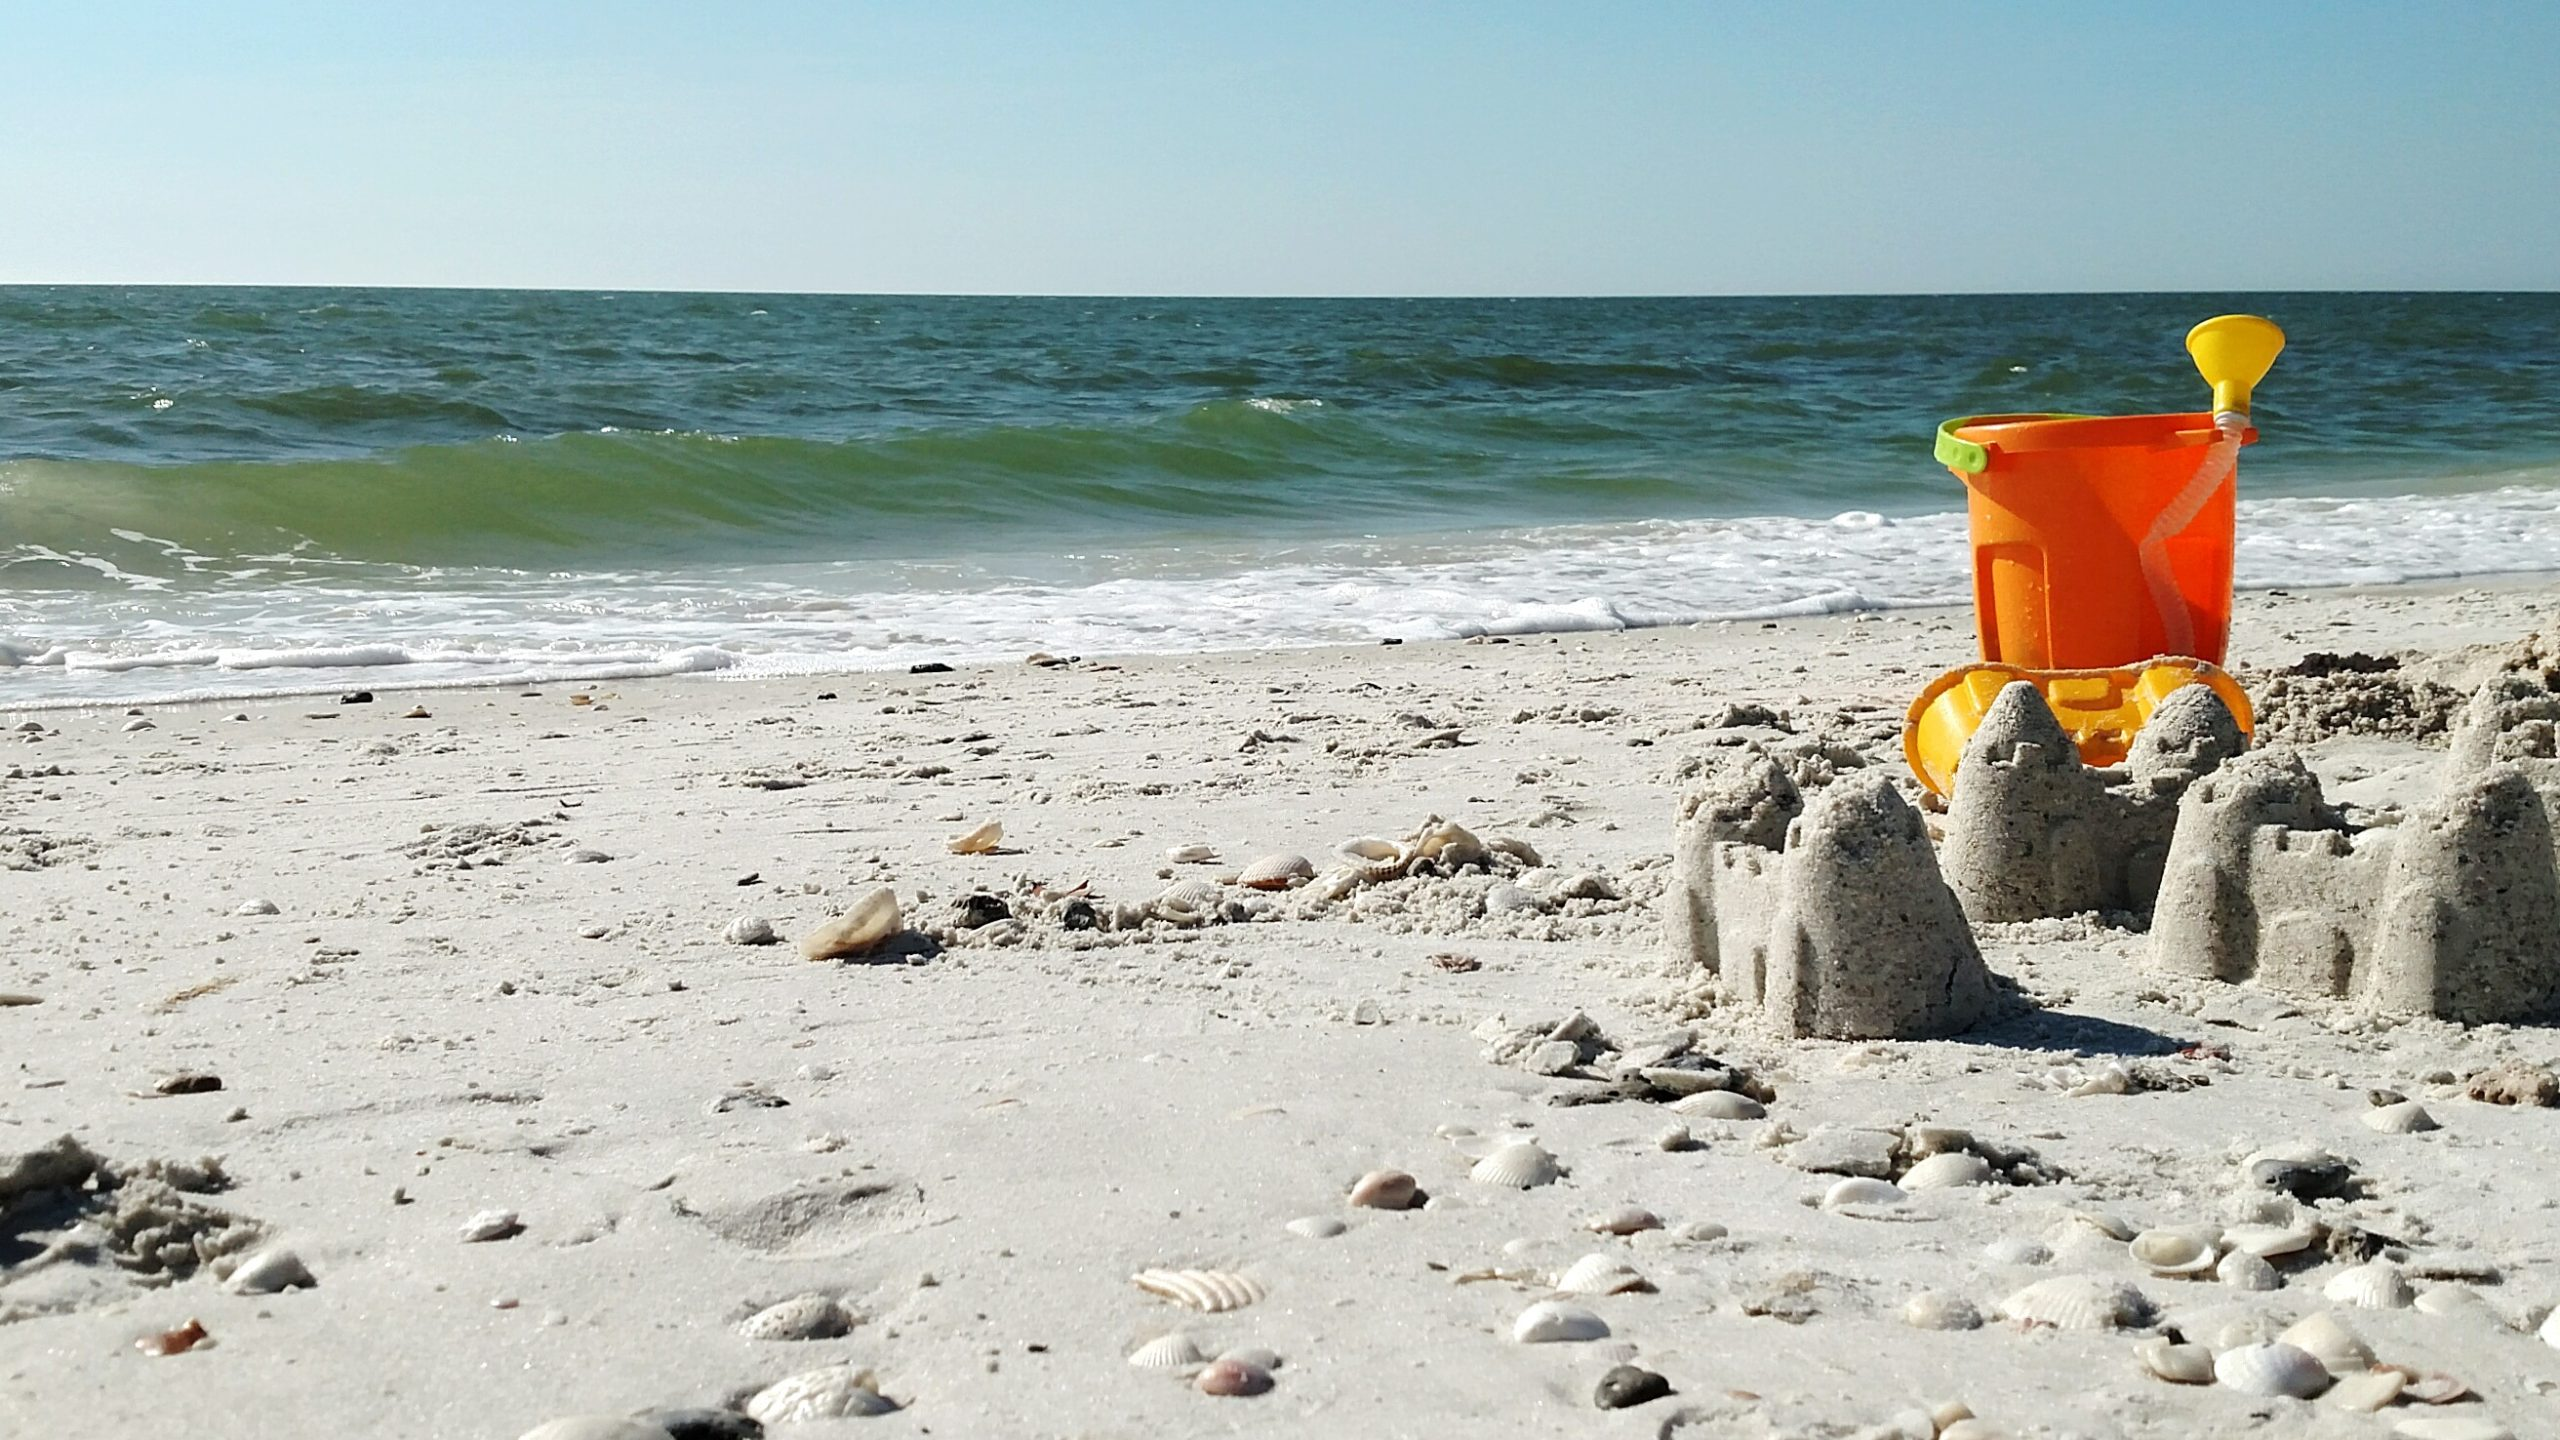 Sandcastles and sand toys on the beach